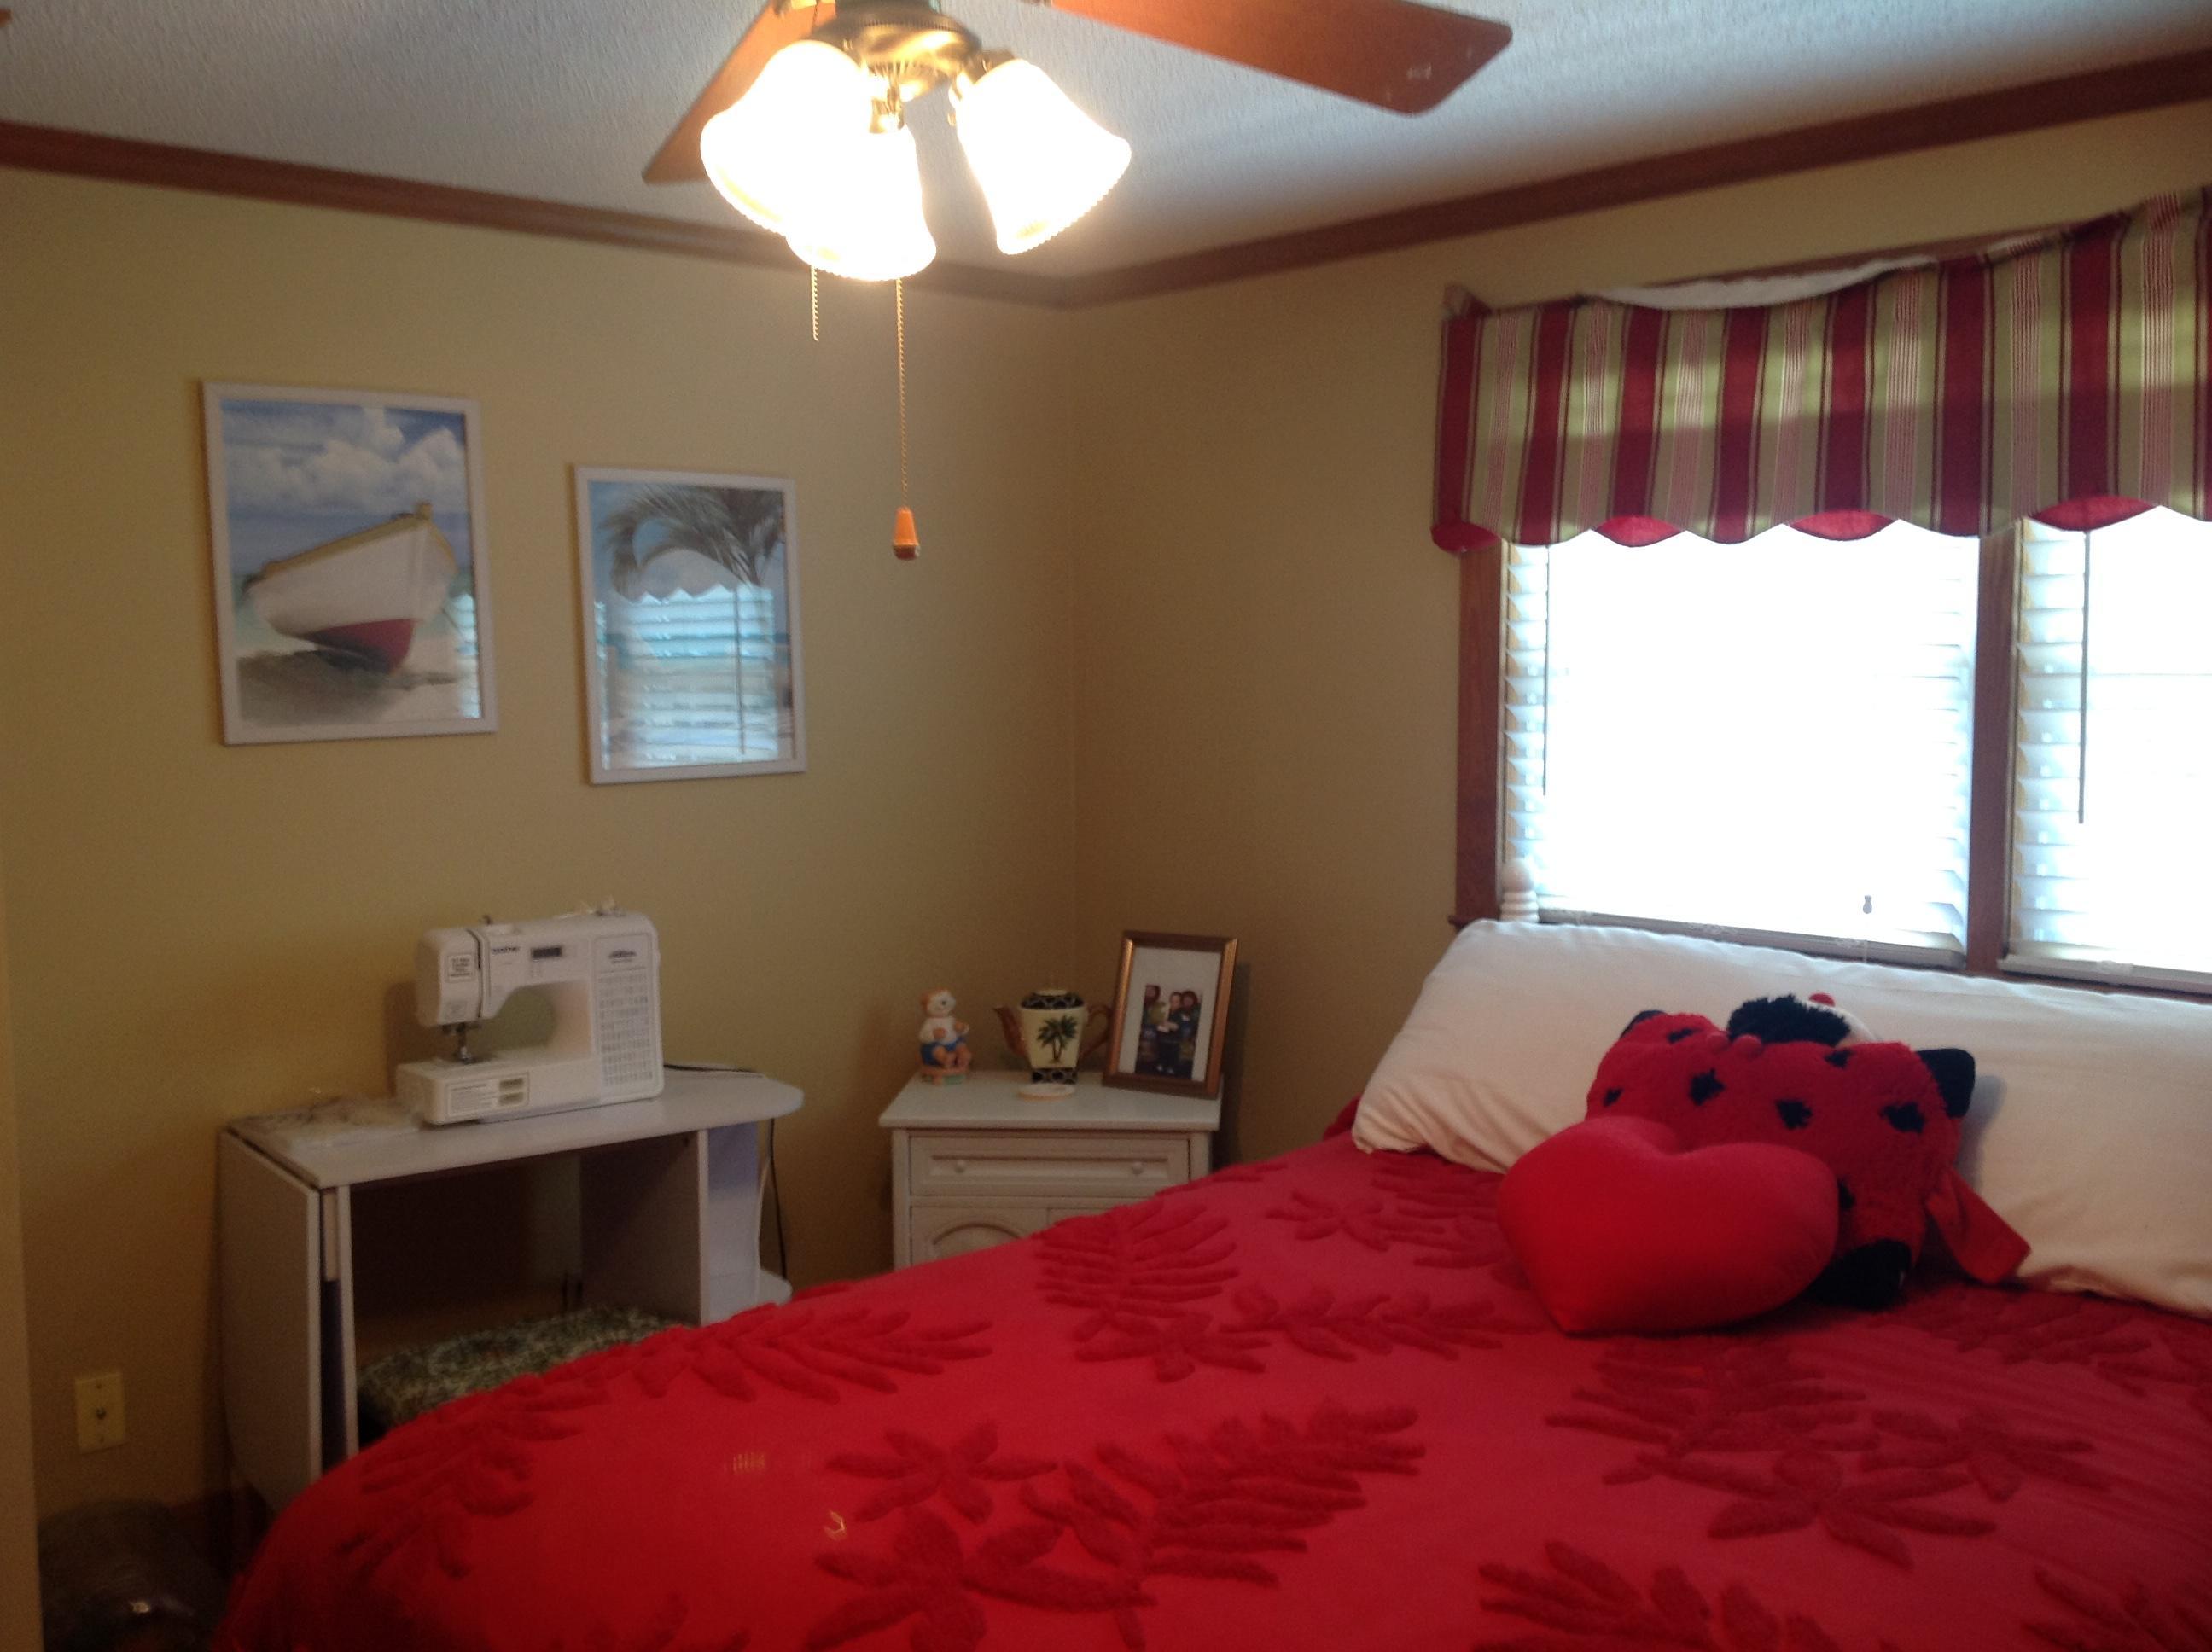 Belvedere II Homes For Sale - 122 Dogwood, Eutawville, SC - 10